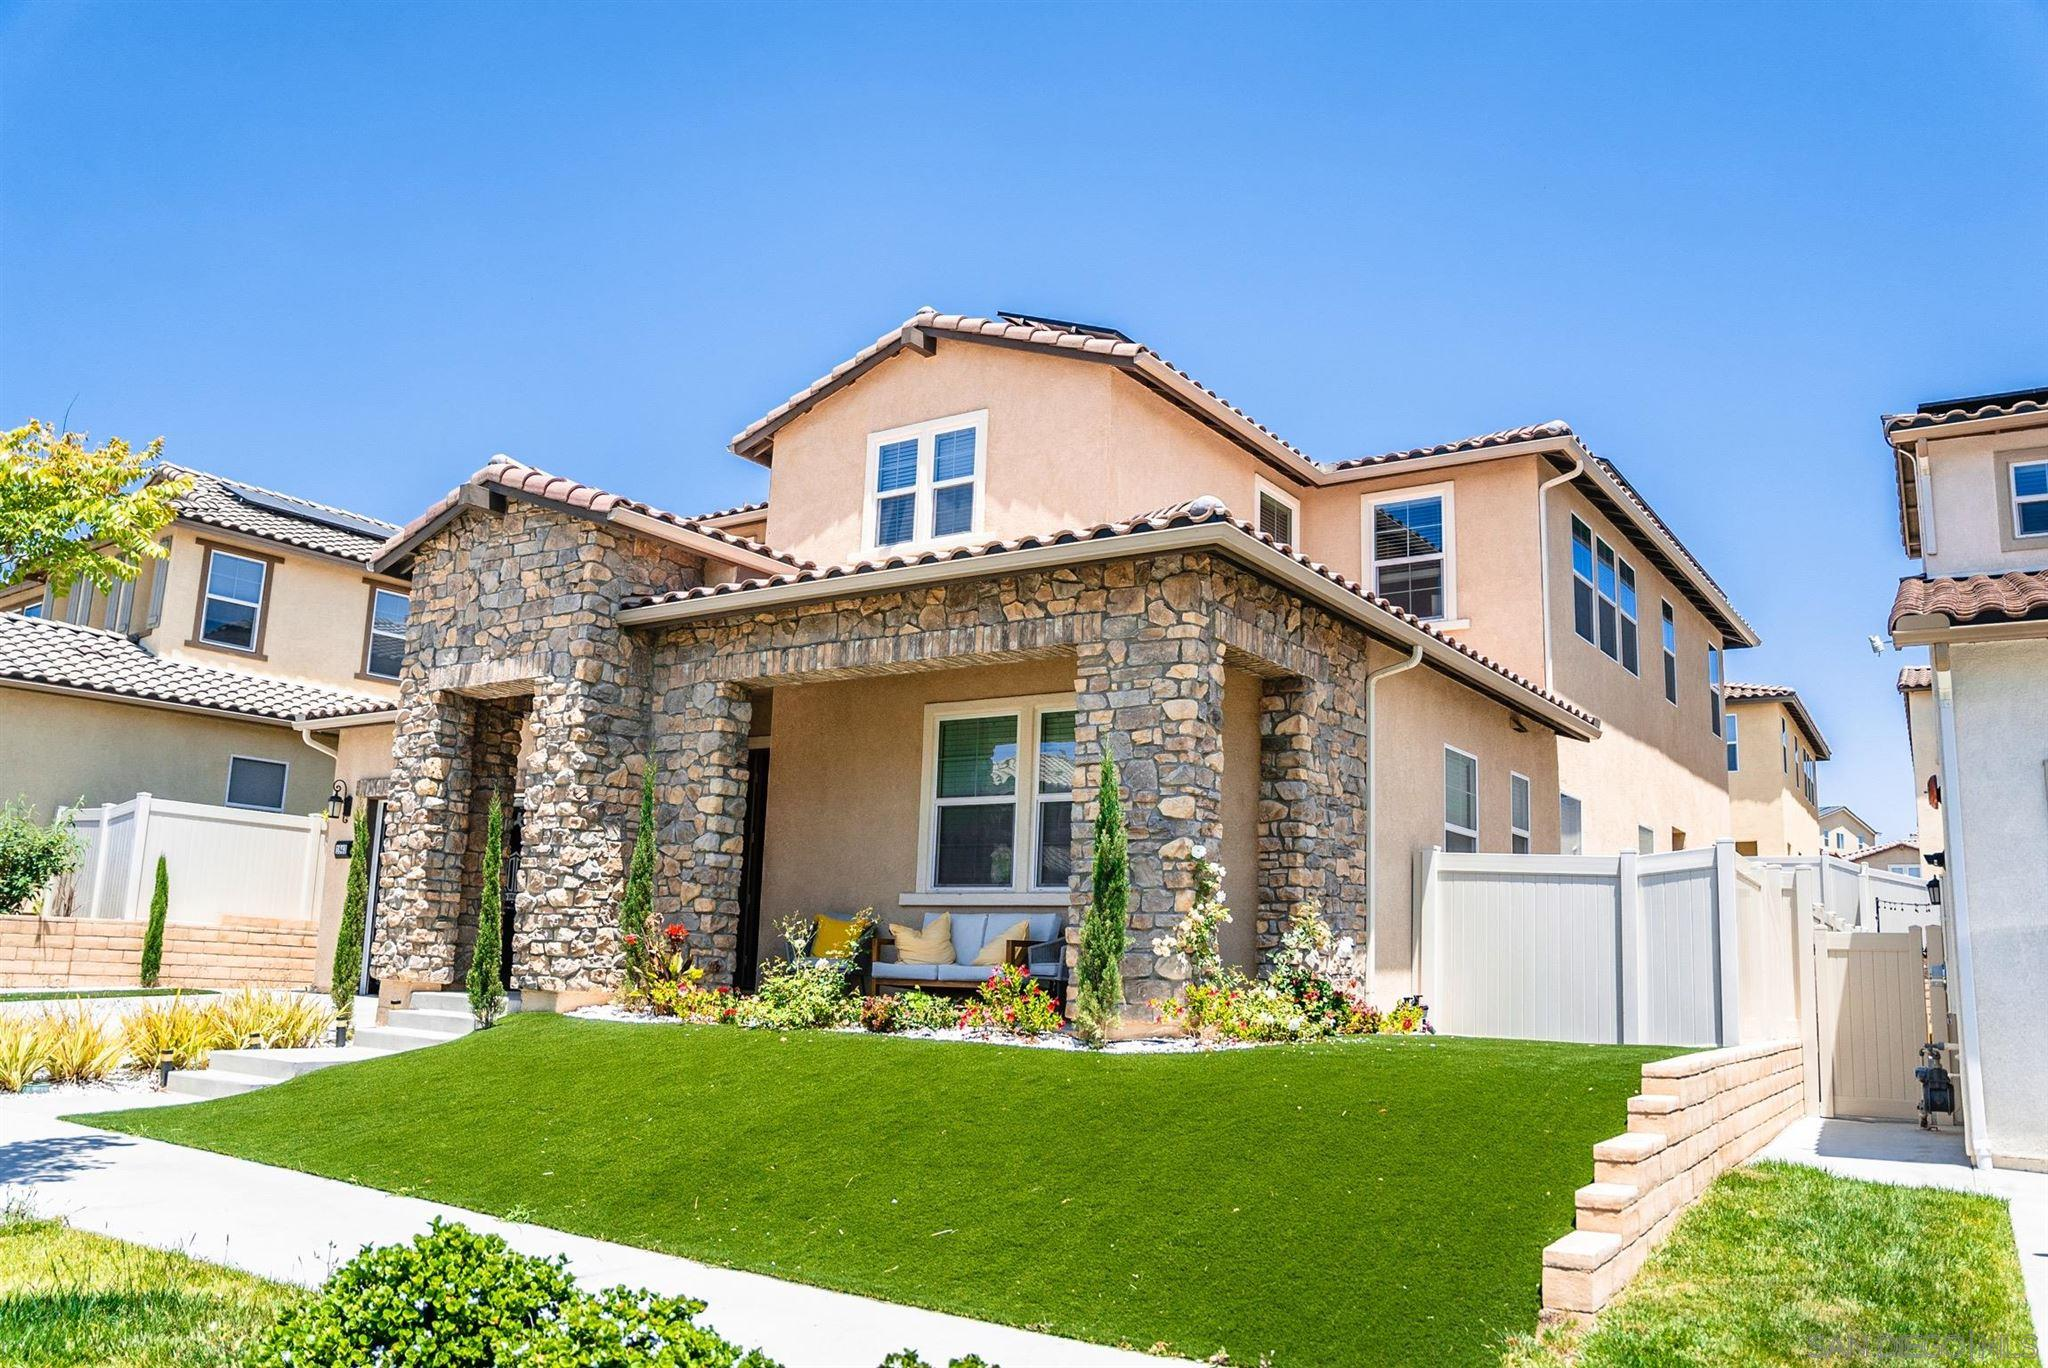 1843 Ashley Ave, Chula Vista, CA 91913